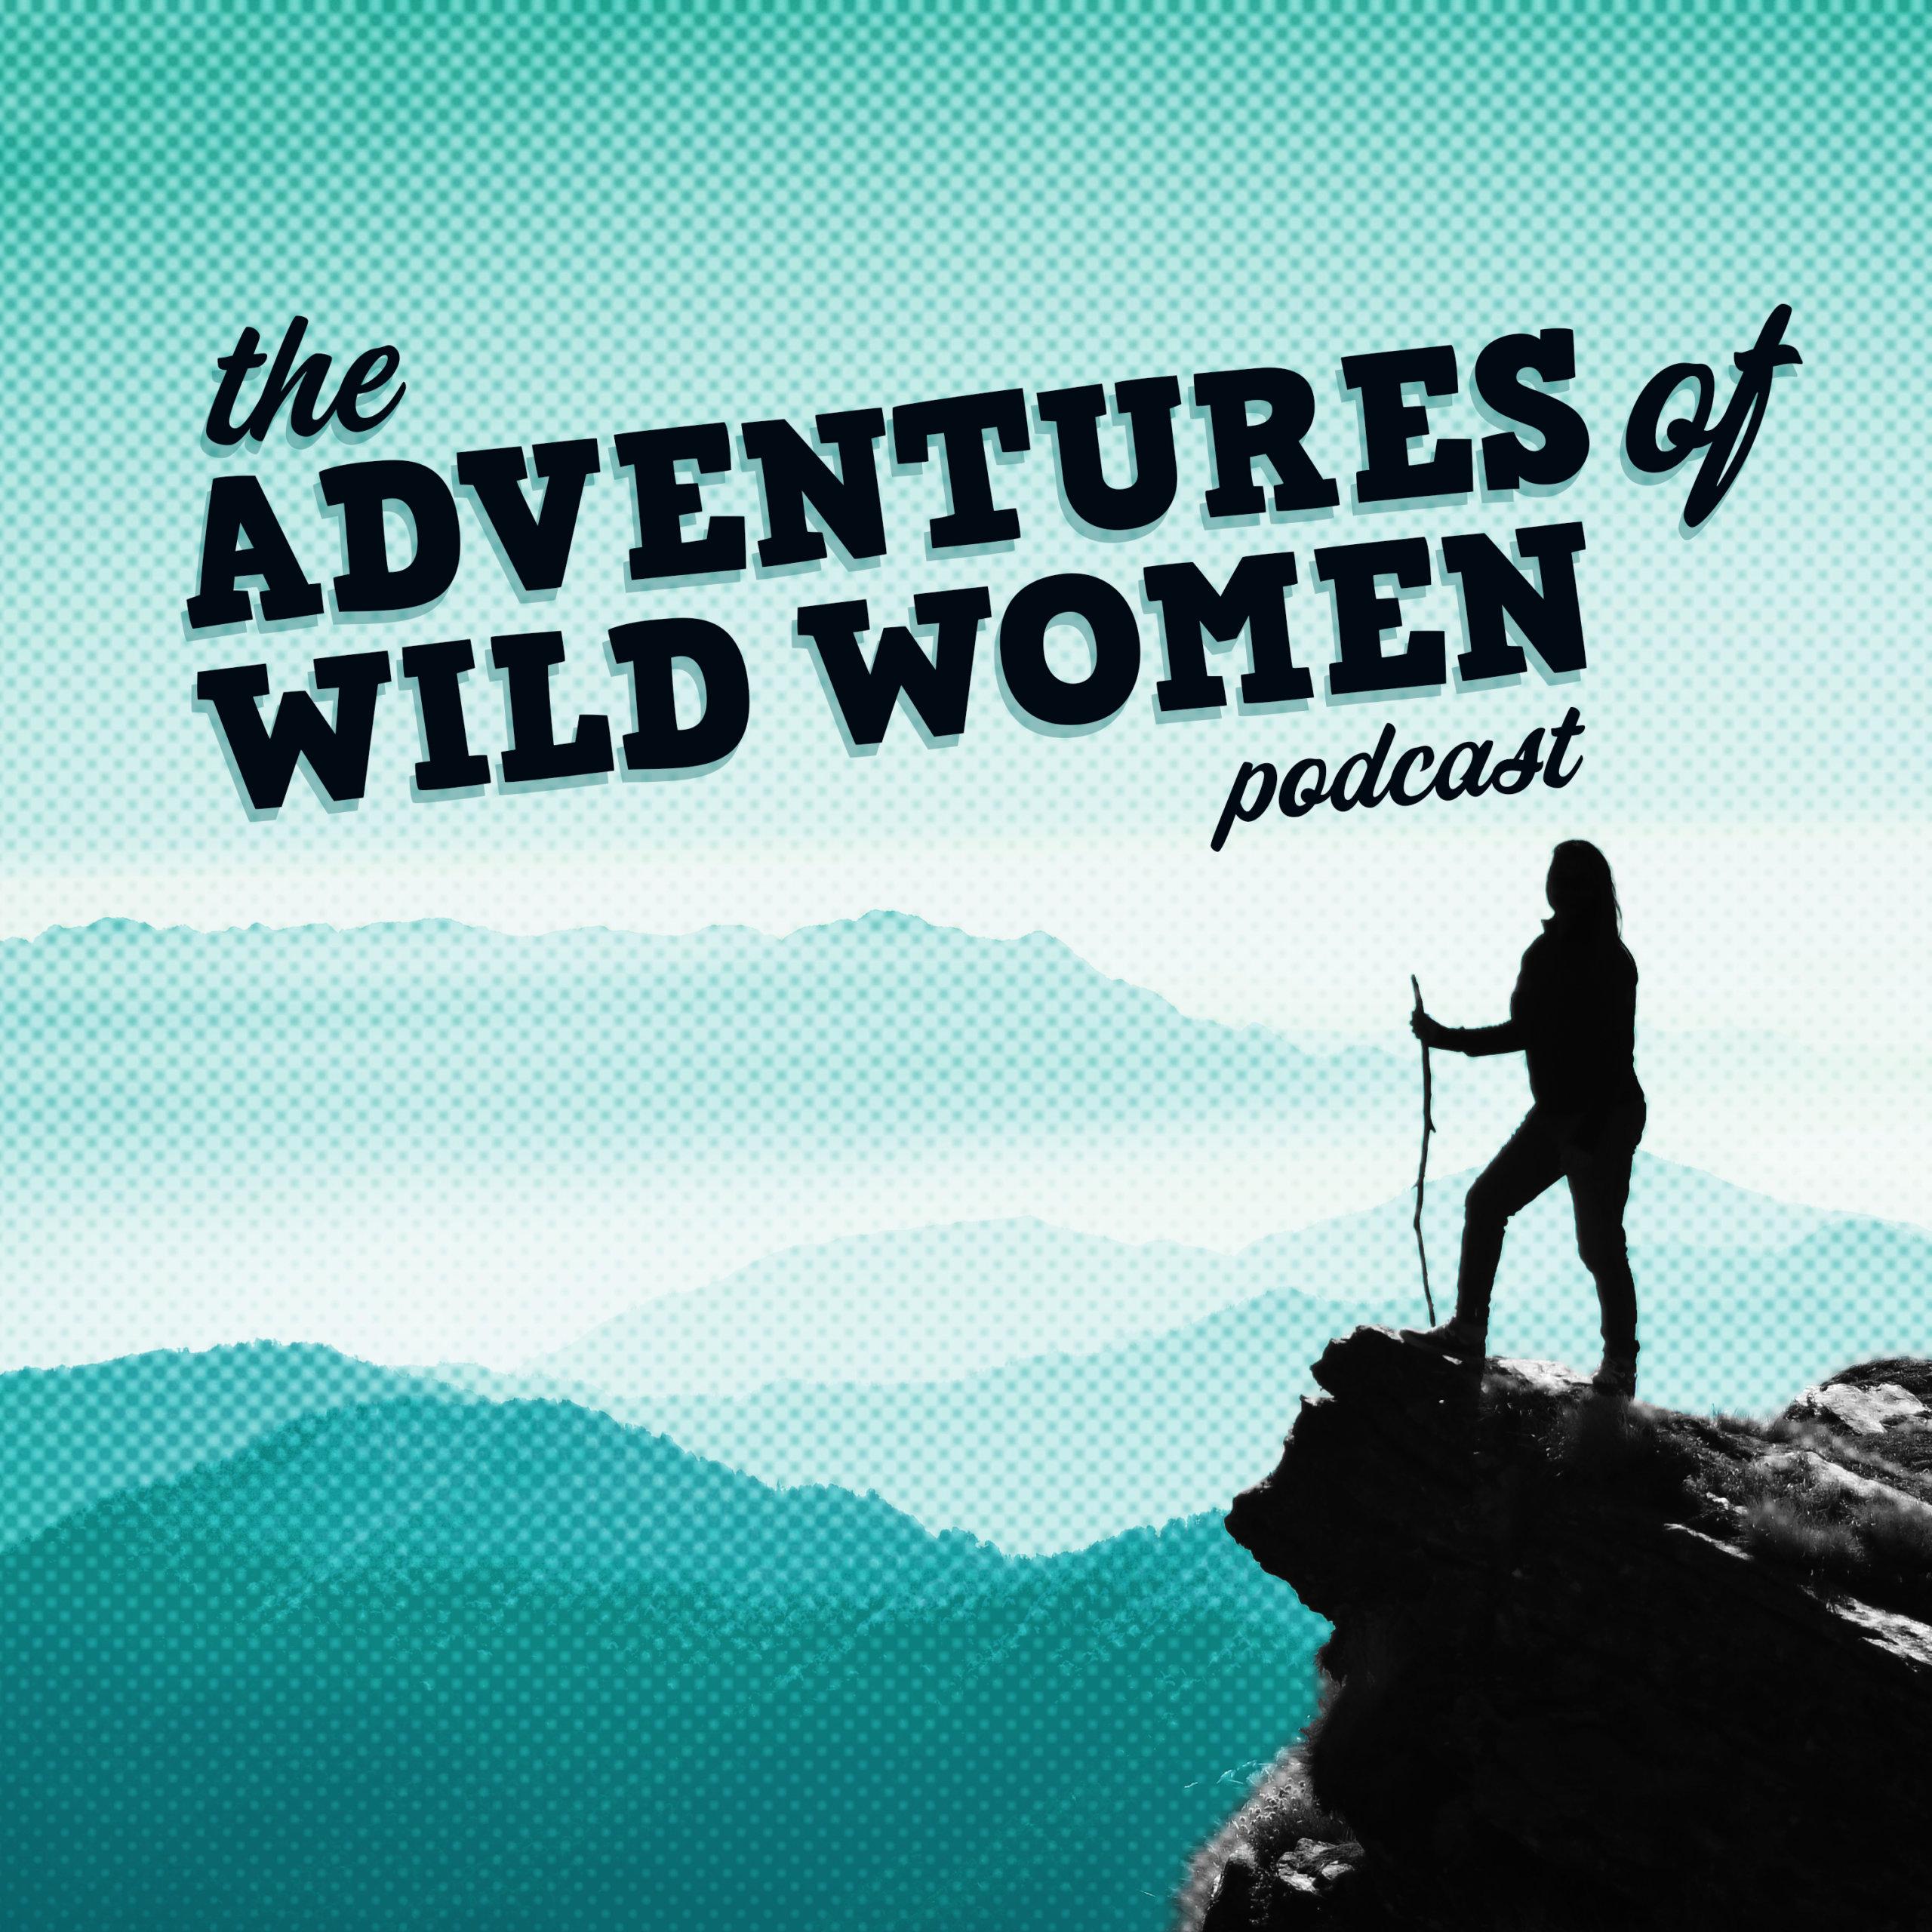 The Adventures Of Wild Women Podcast Trailer